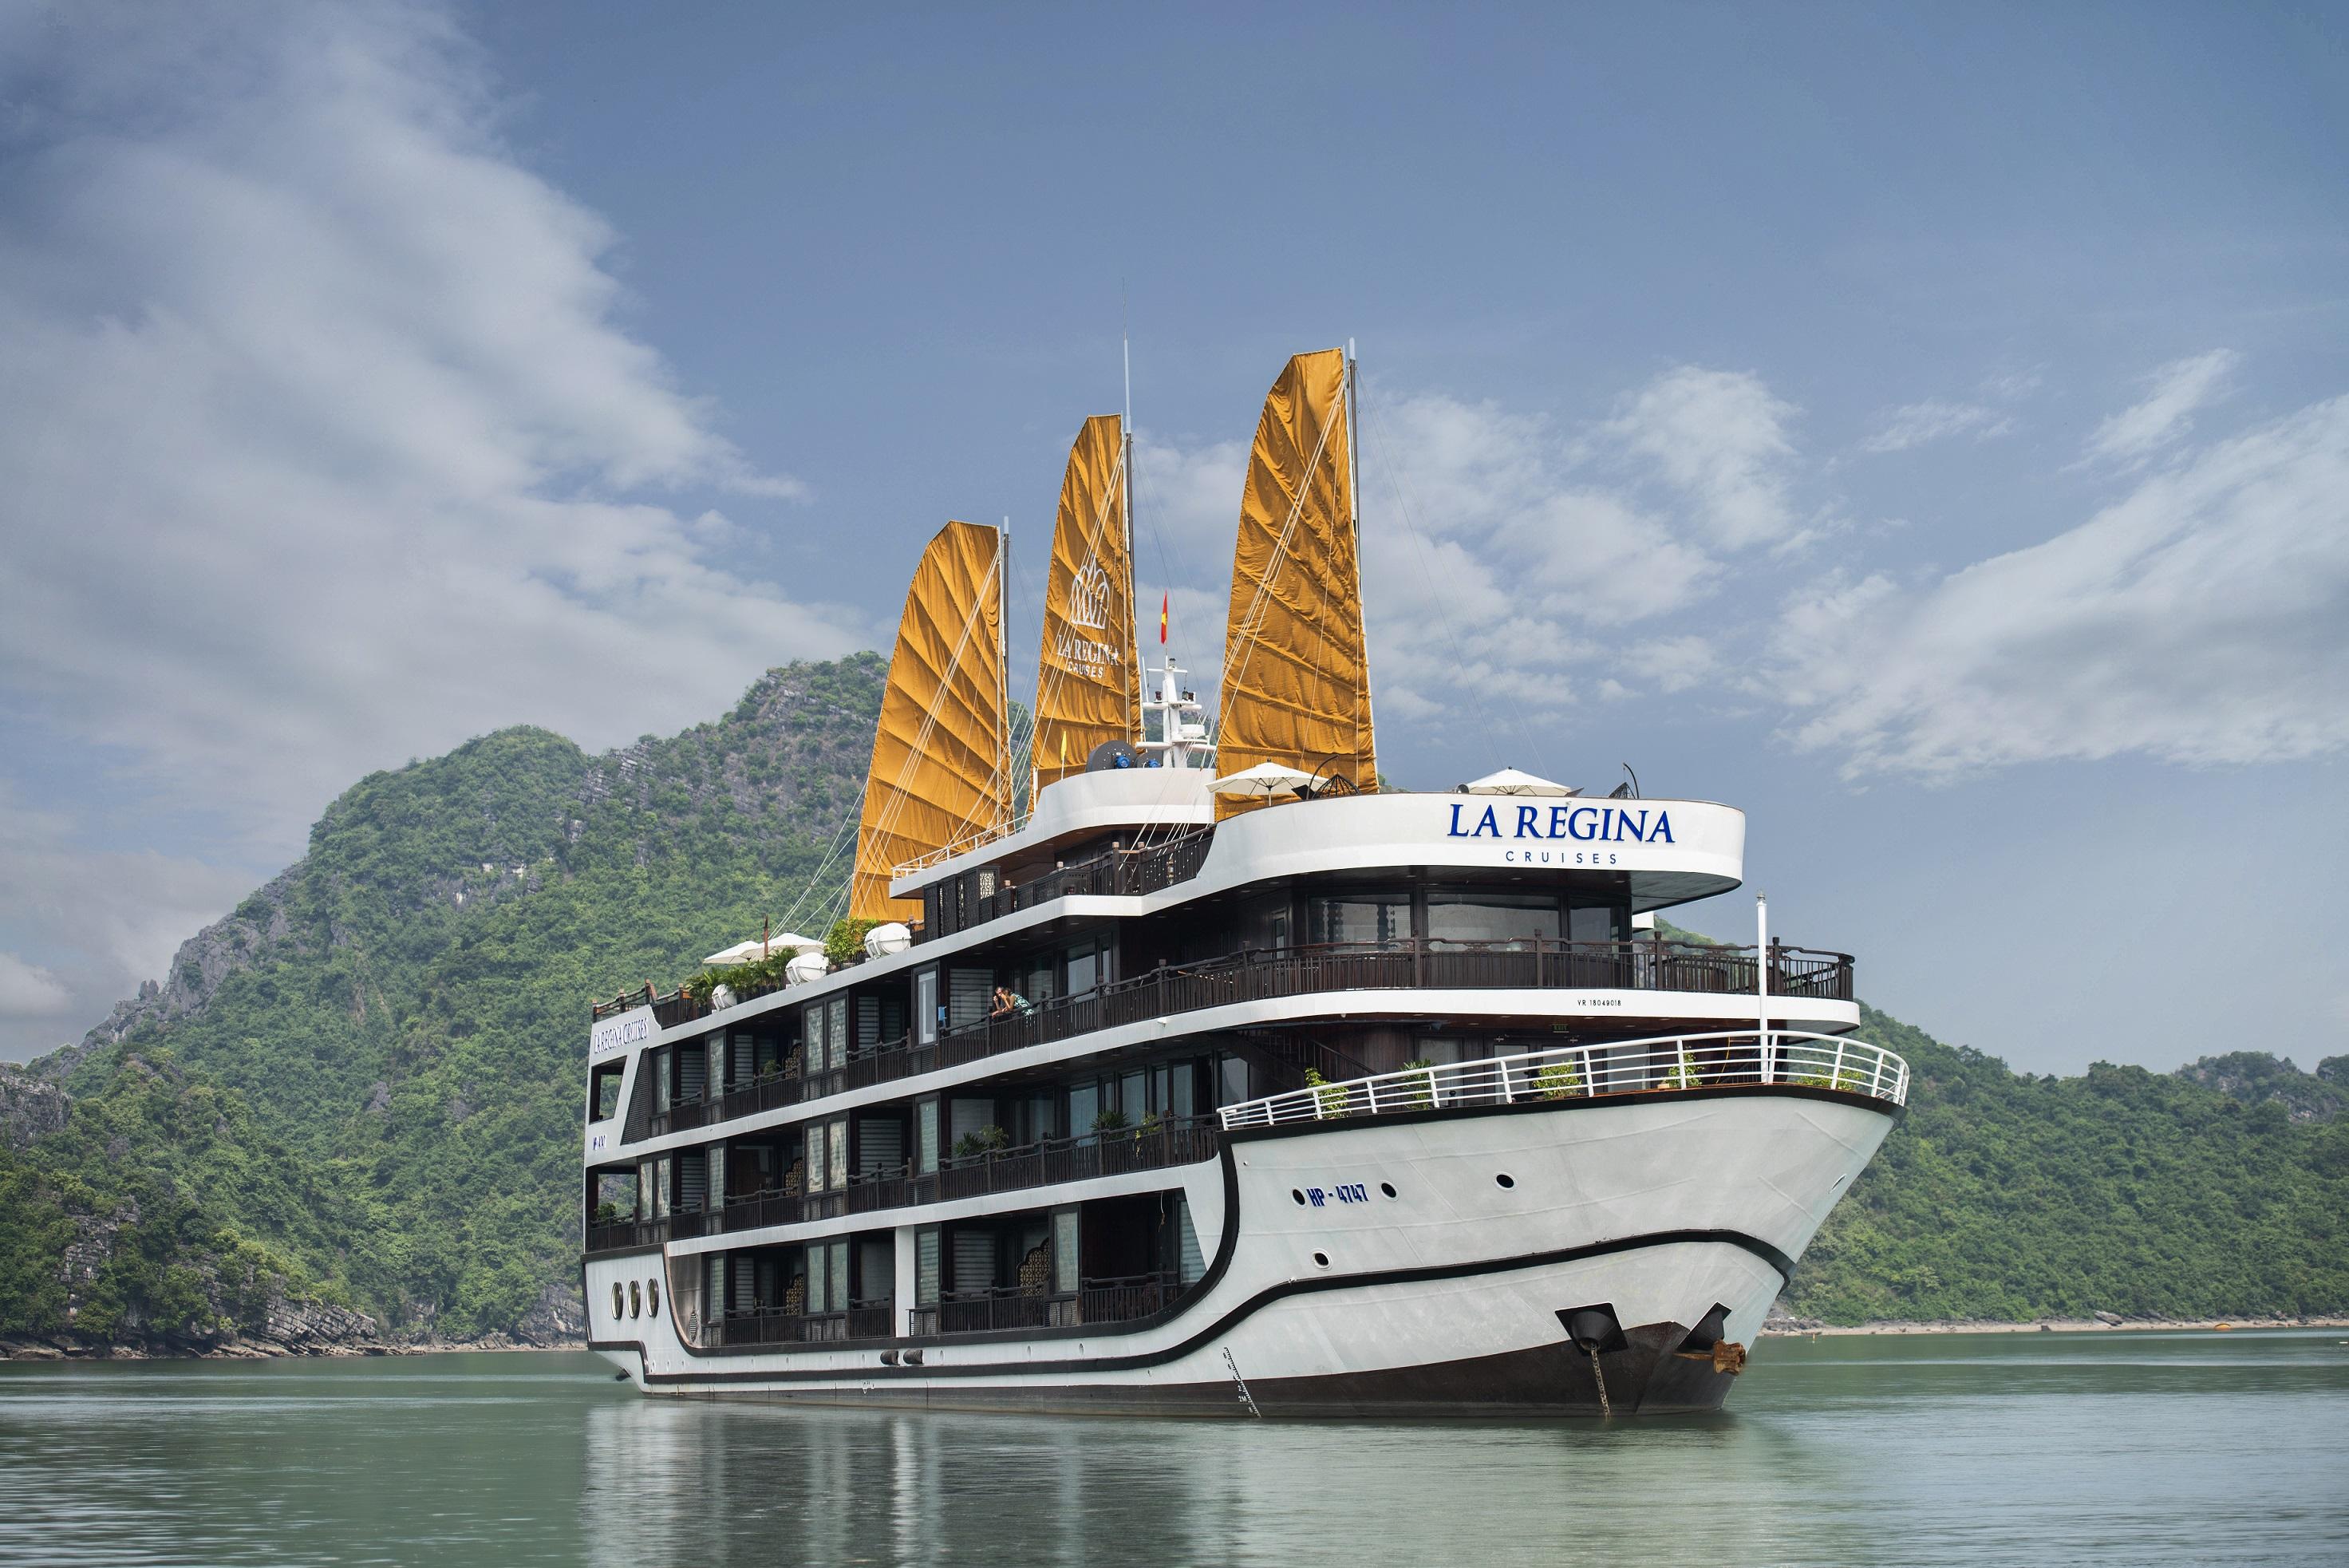 2-day 1 night La Regina Legend Cruise 5 star - Visit Halong Bay and